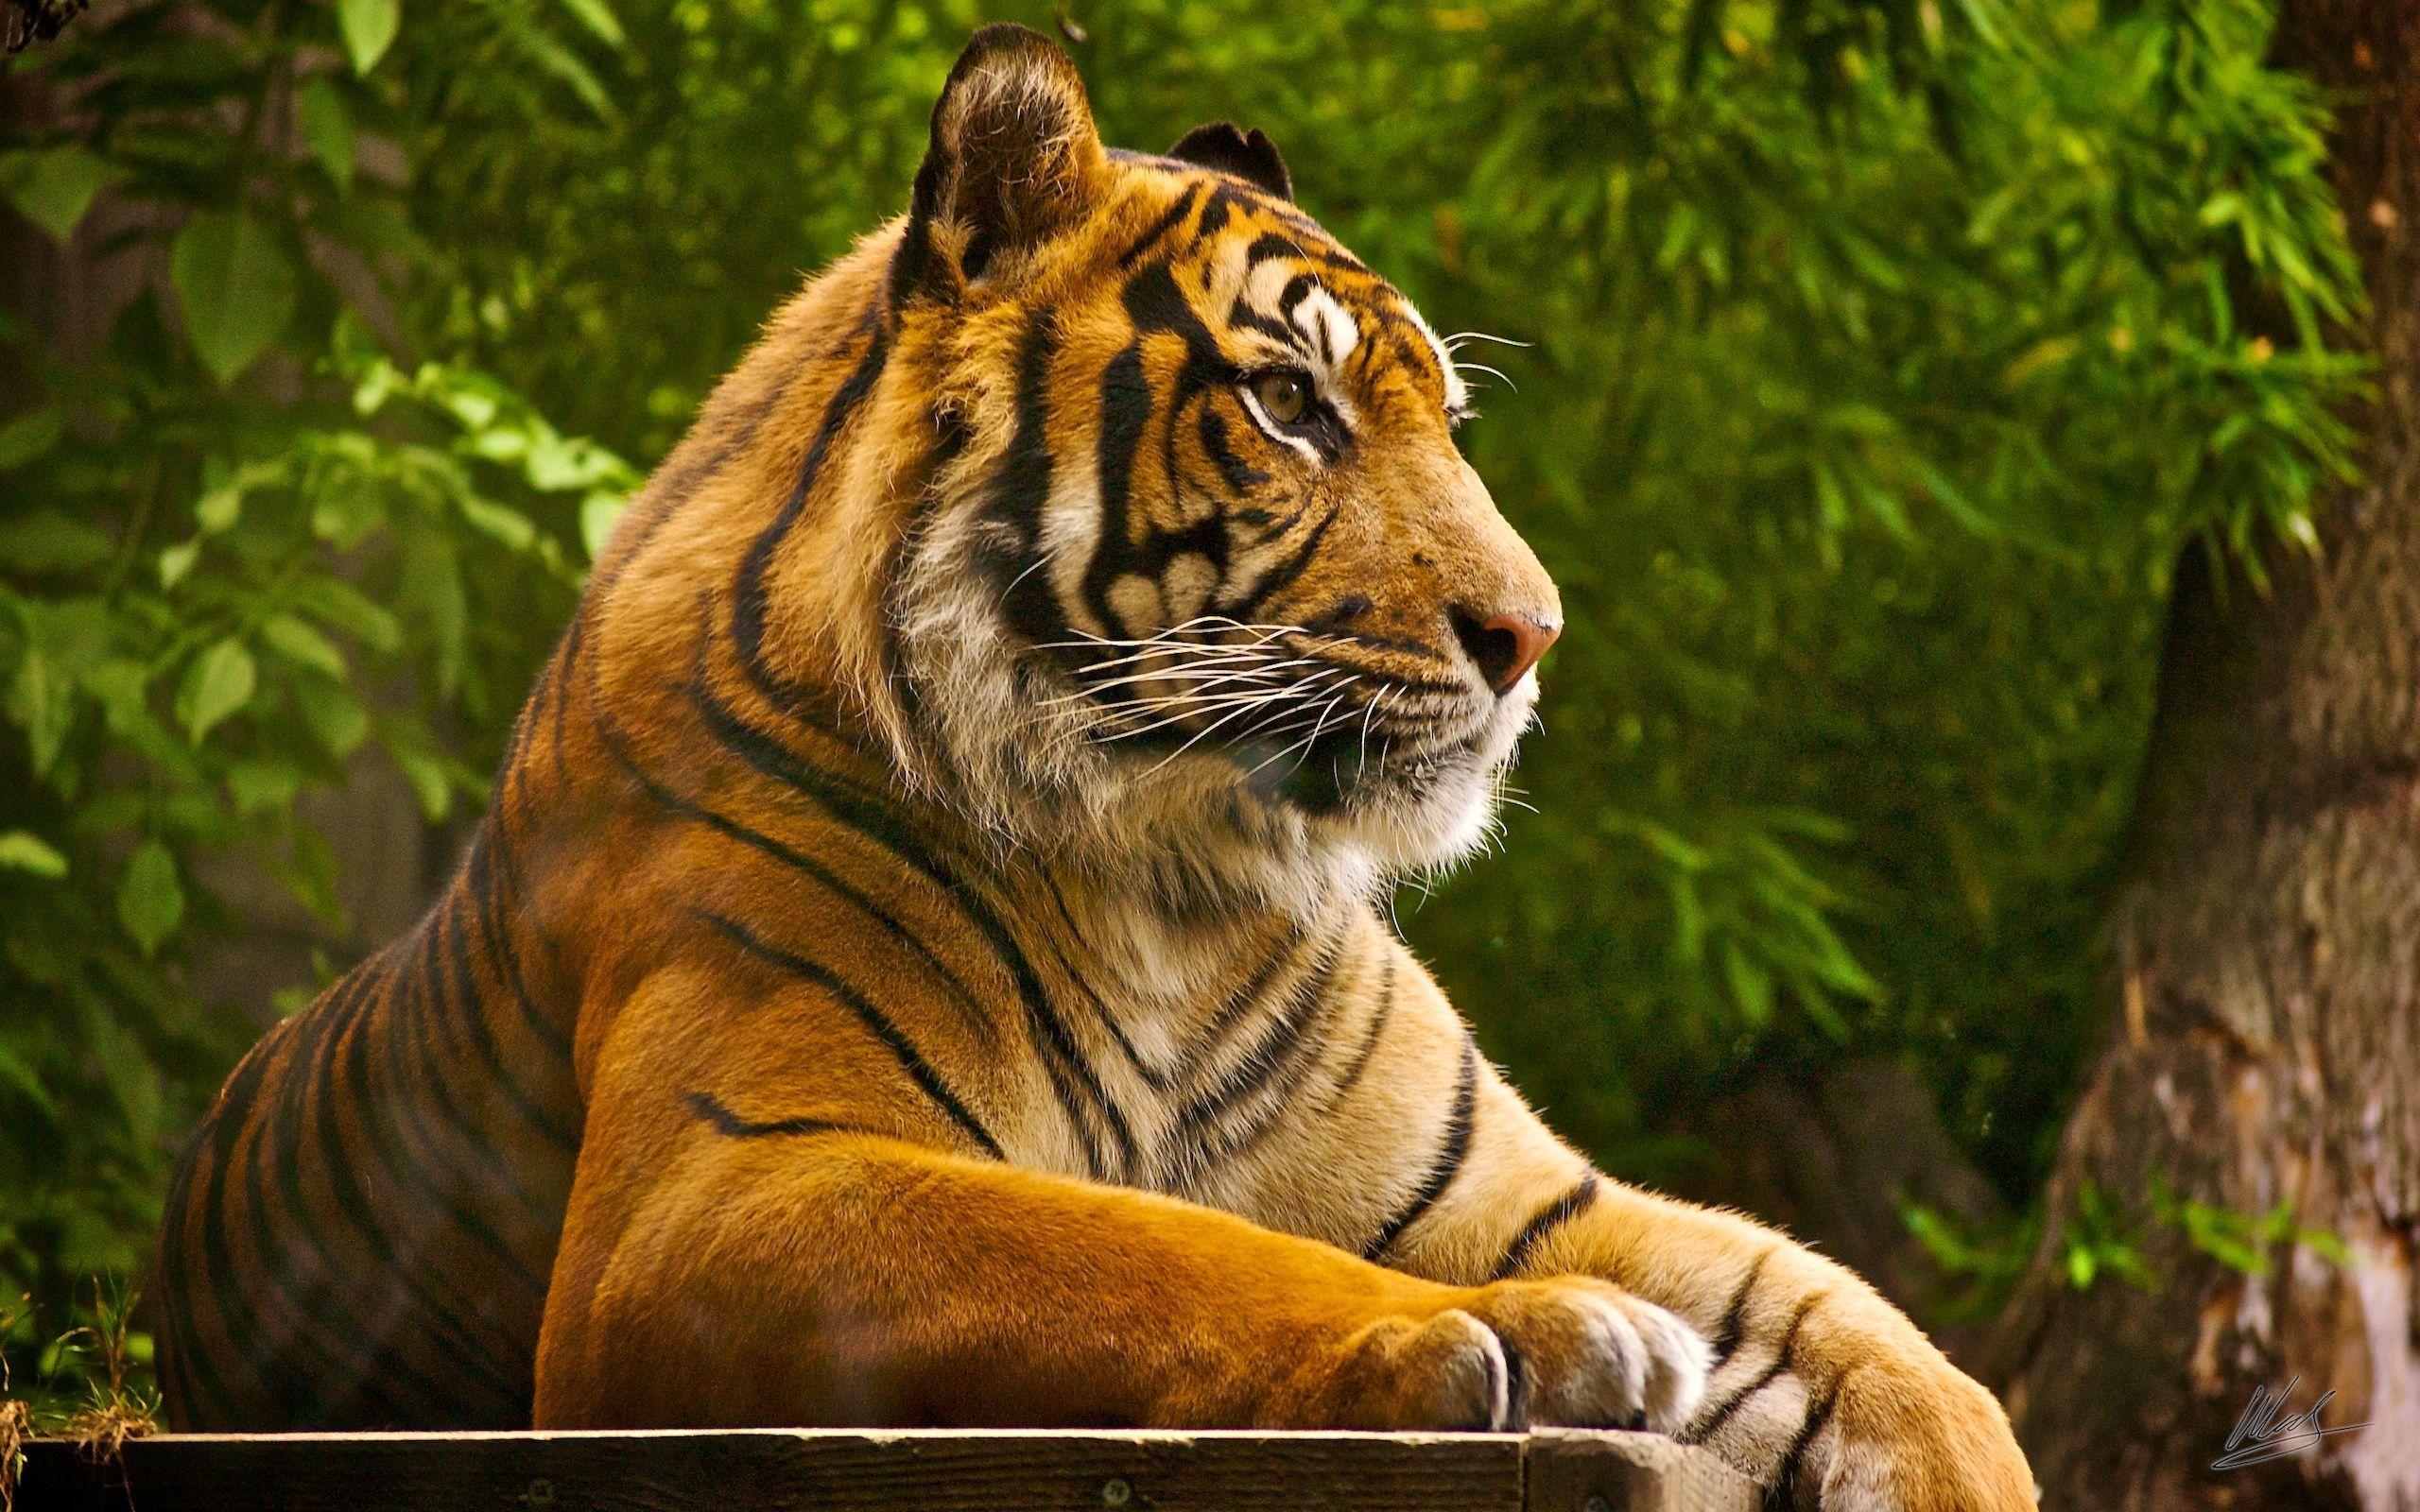 Hd wallpaper zone - Sumatran Tiger Wallpapers Hd Wallpapers Wallpaper Zone